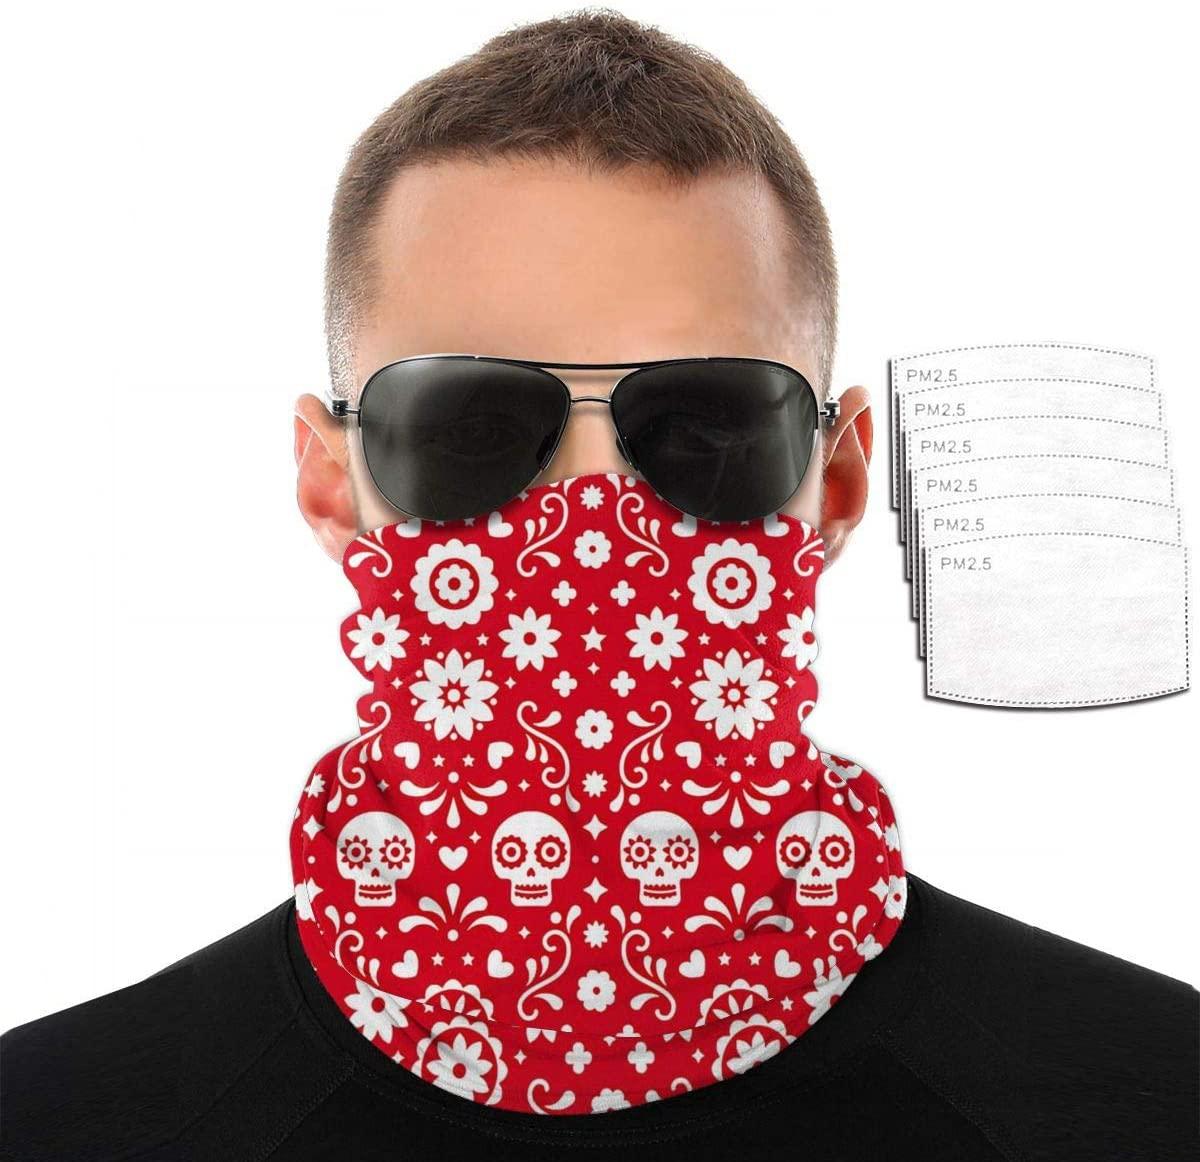 Headwear Unisex White Skull Variety Face Towel Headbands Insert Carbon Filter Bandana Neck Gaiter Face Protector For Dust Outdoors